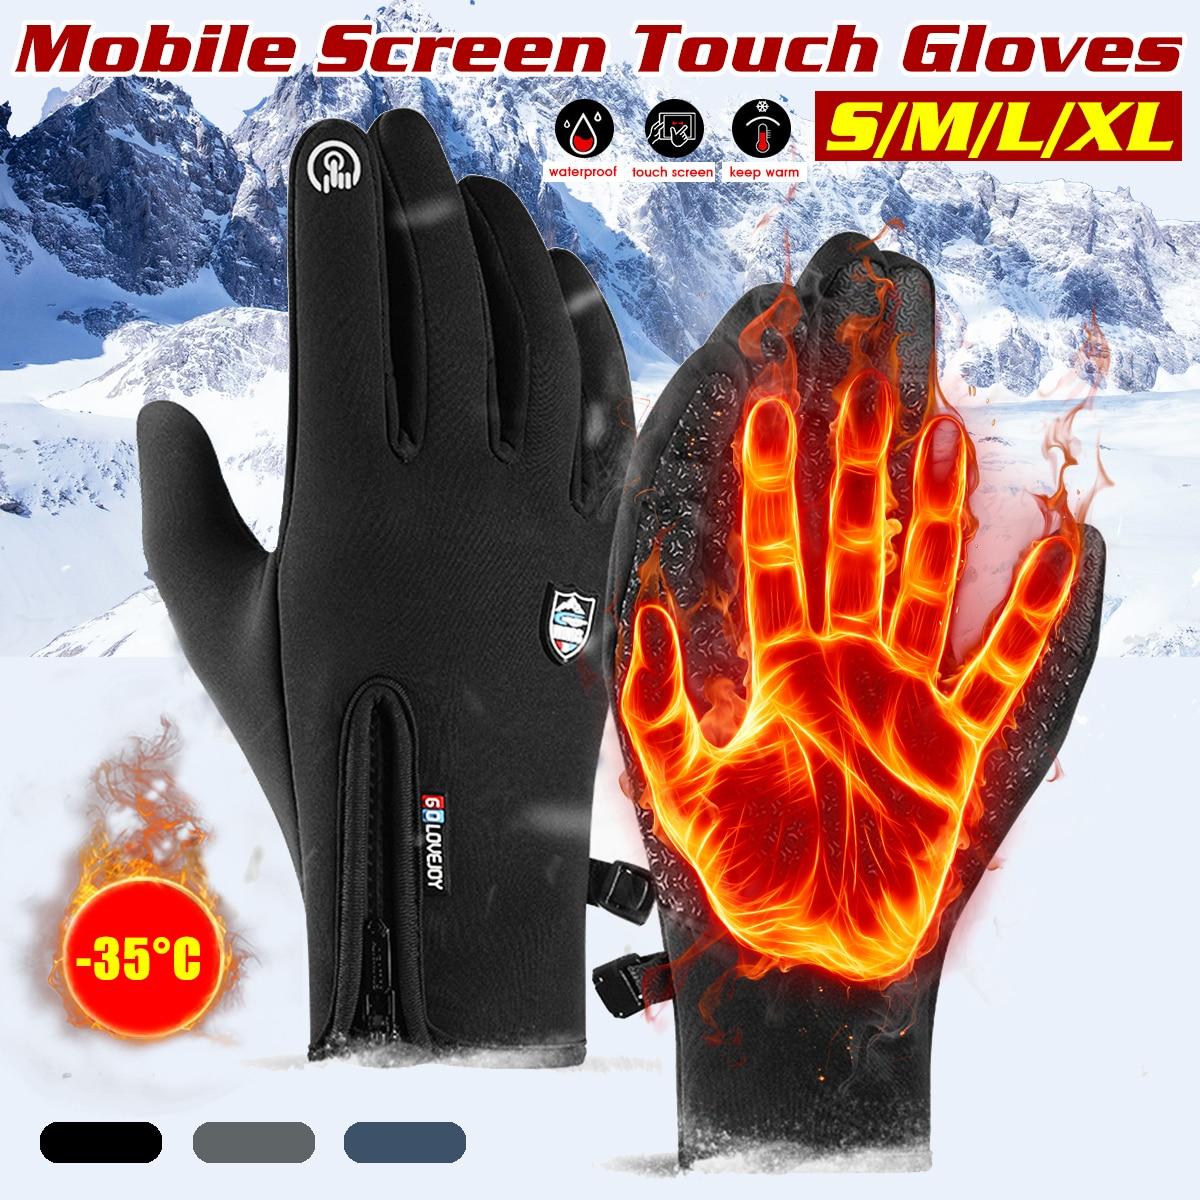 Ski Gloves Waterproof Fleece Thermal Gloves Snowboard Snowmobile Gloves Men Women Winter Gloves For Sonwboarding